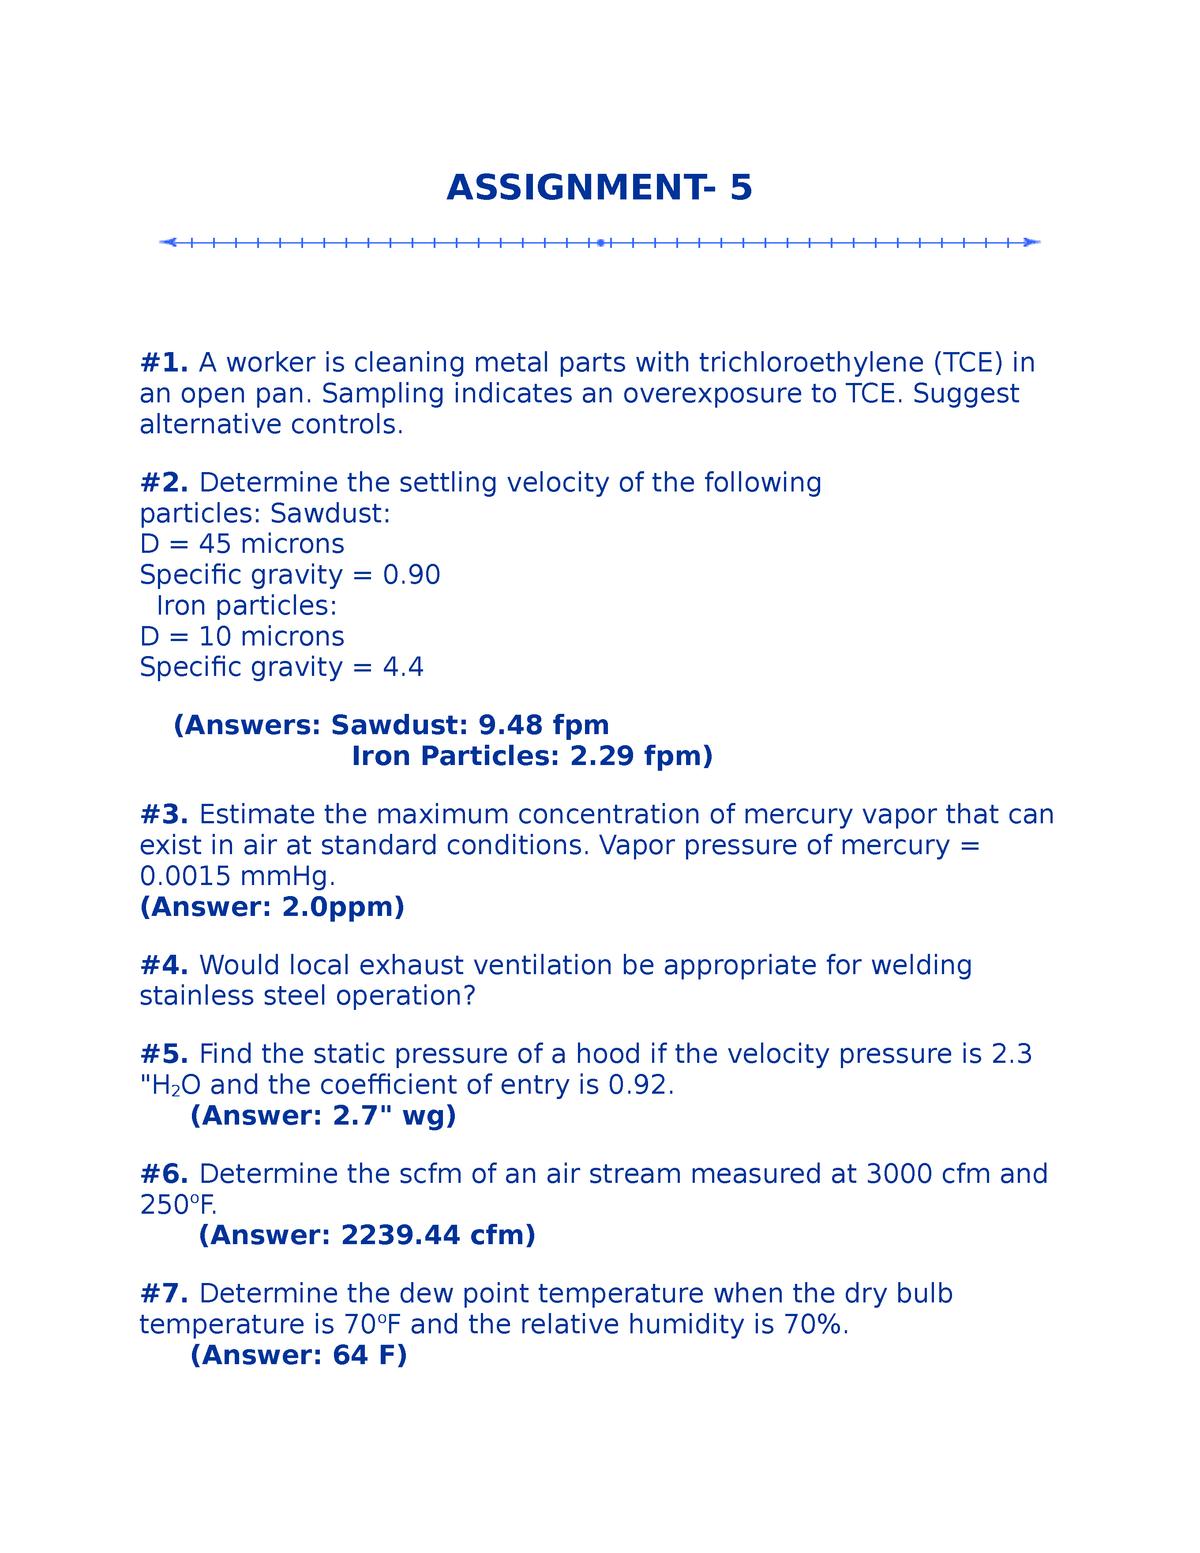 Assignment 5 - Ashok Kumar - CIVE 4670: Industrial Ventilation - StuDocu